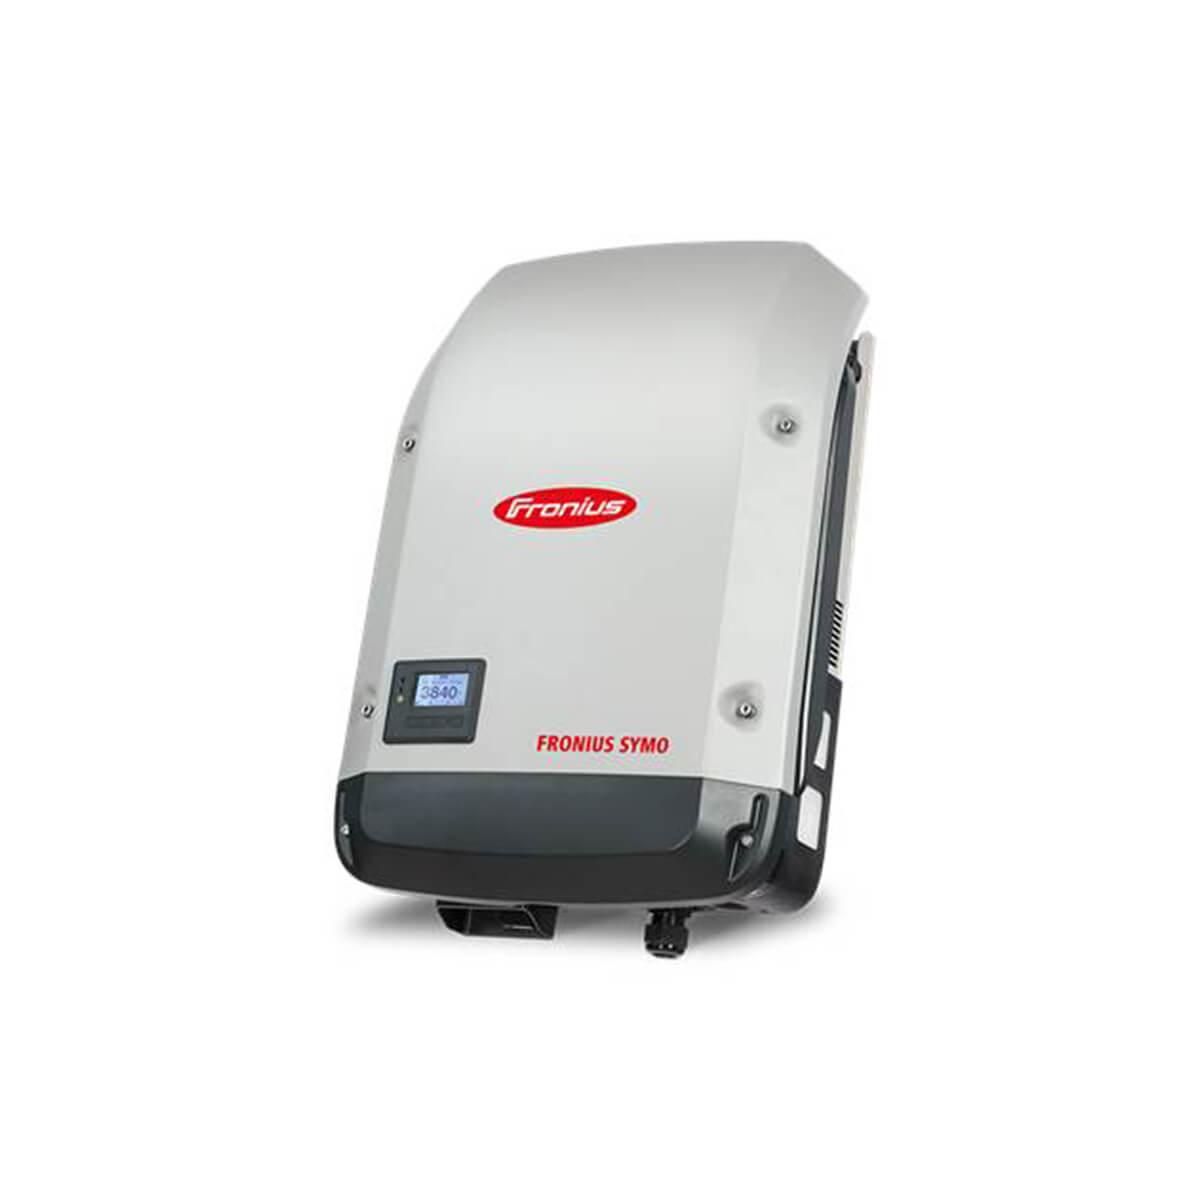 fronius 3.7kW inverter, fronius symo 3.7kW inverter, fronius symo 3.7-3-s inverter, fronius symo 3.7-3-s, fronius symo 3.7 kW